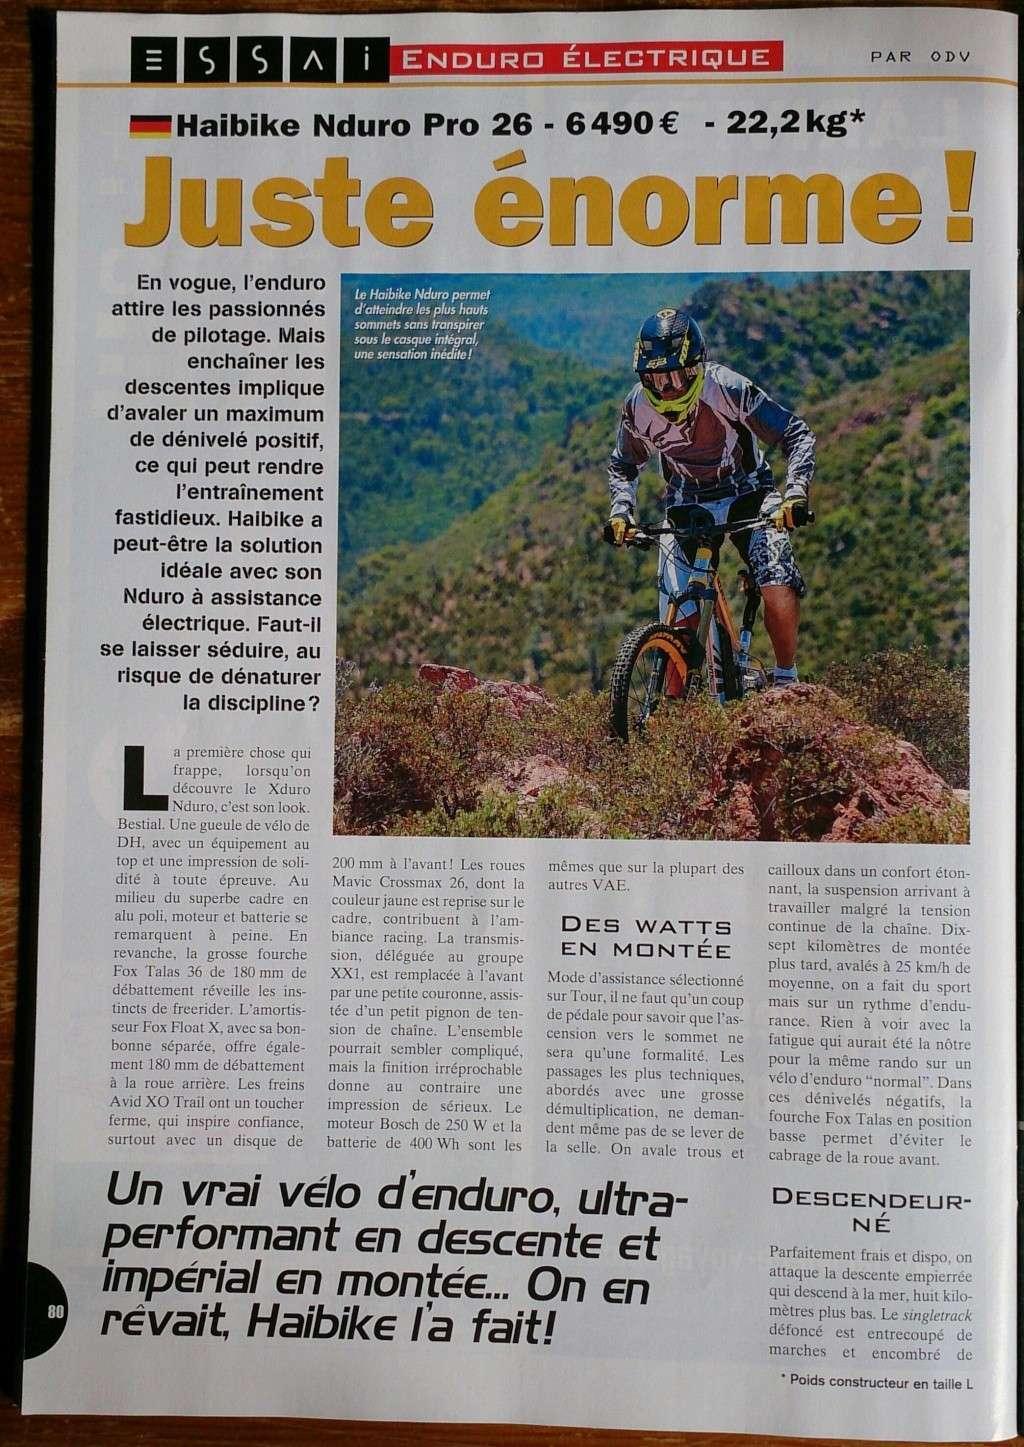 [Luidji76] Mon nouveau bike: VAE Haibike XDURO NDURO RX 26 - Page 2 Dsc_0110